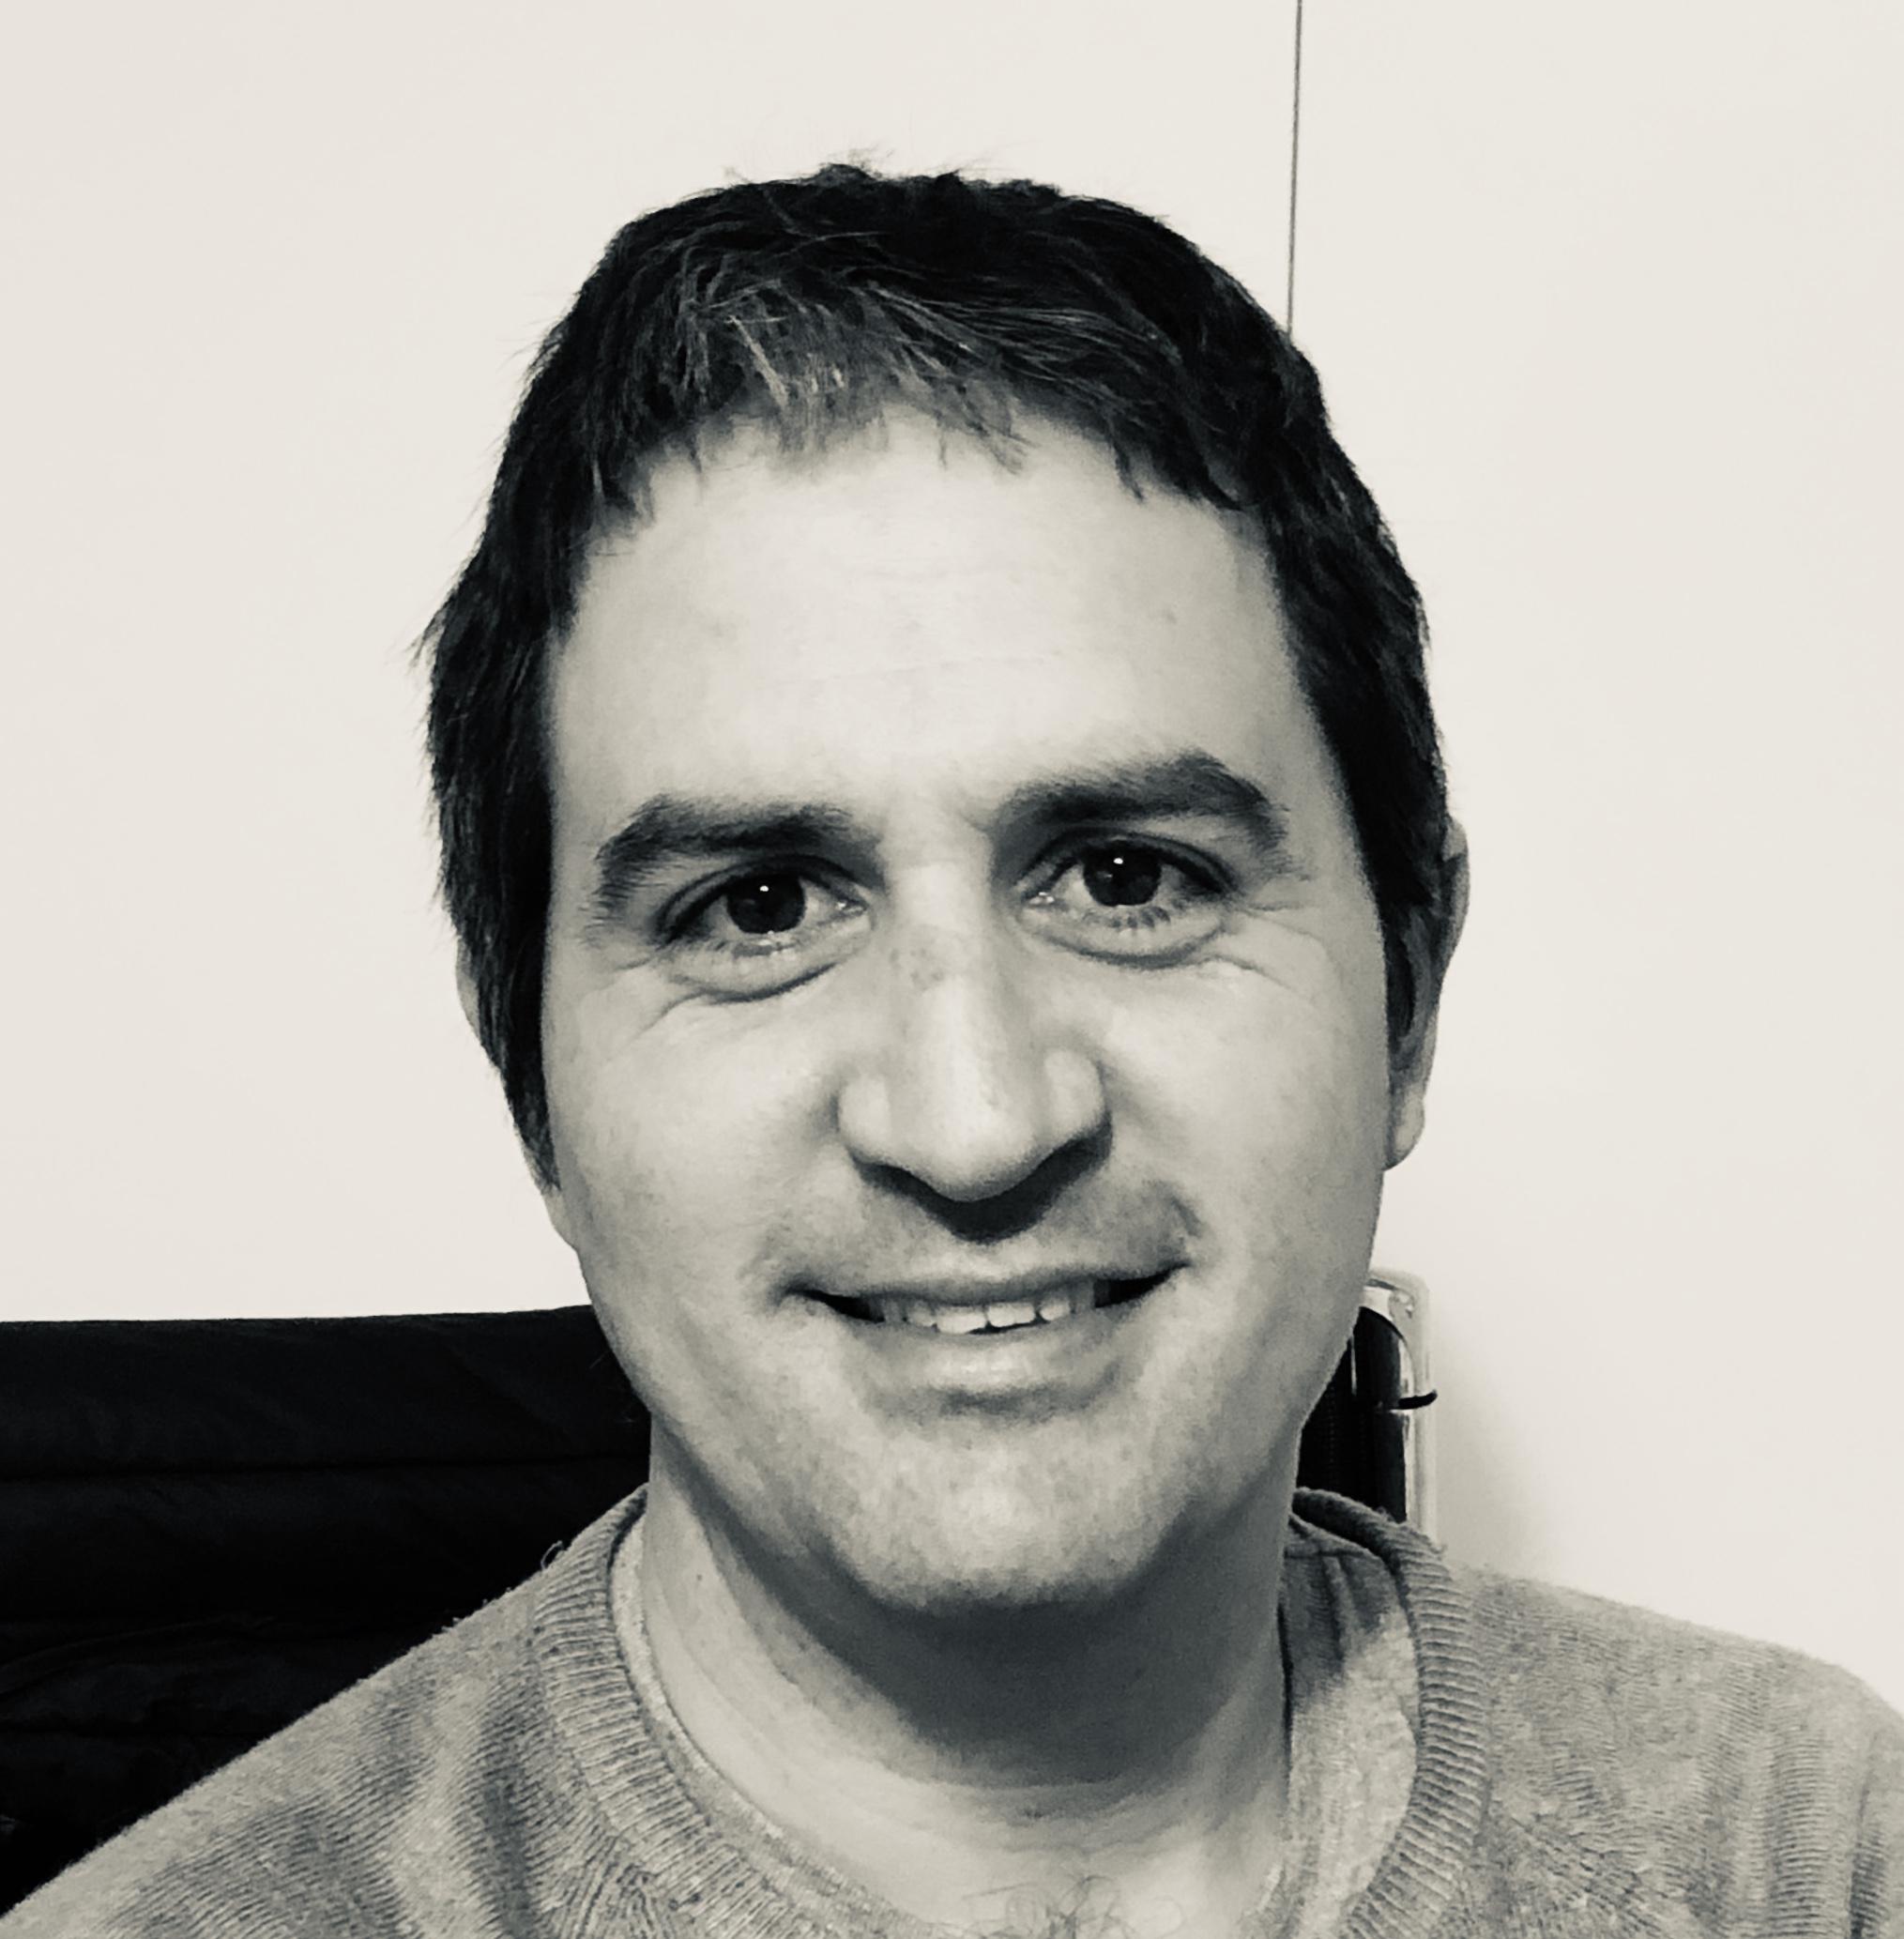 JORGE PAMPLONA GARCIA